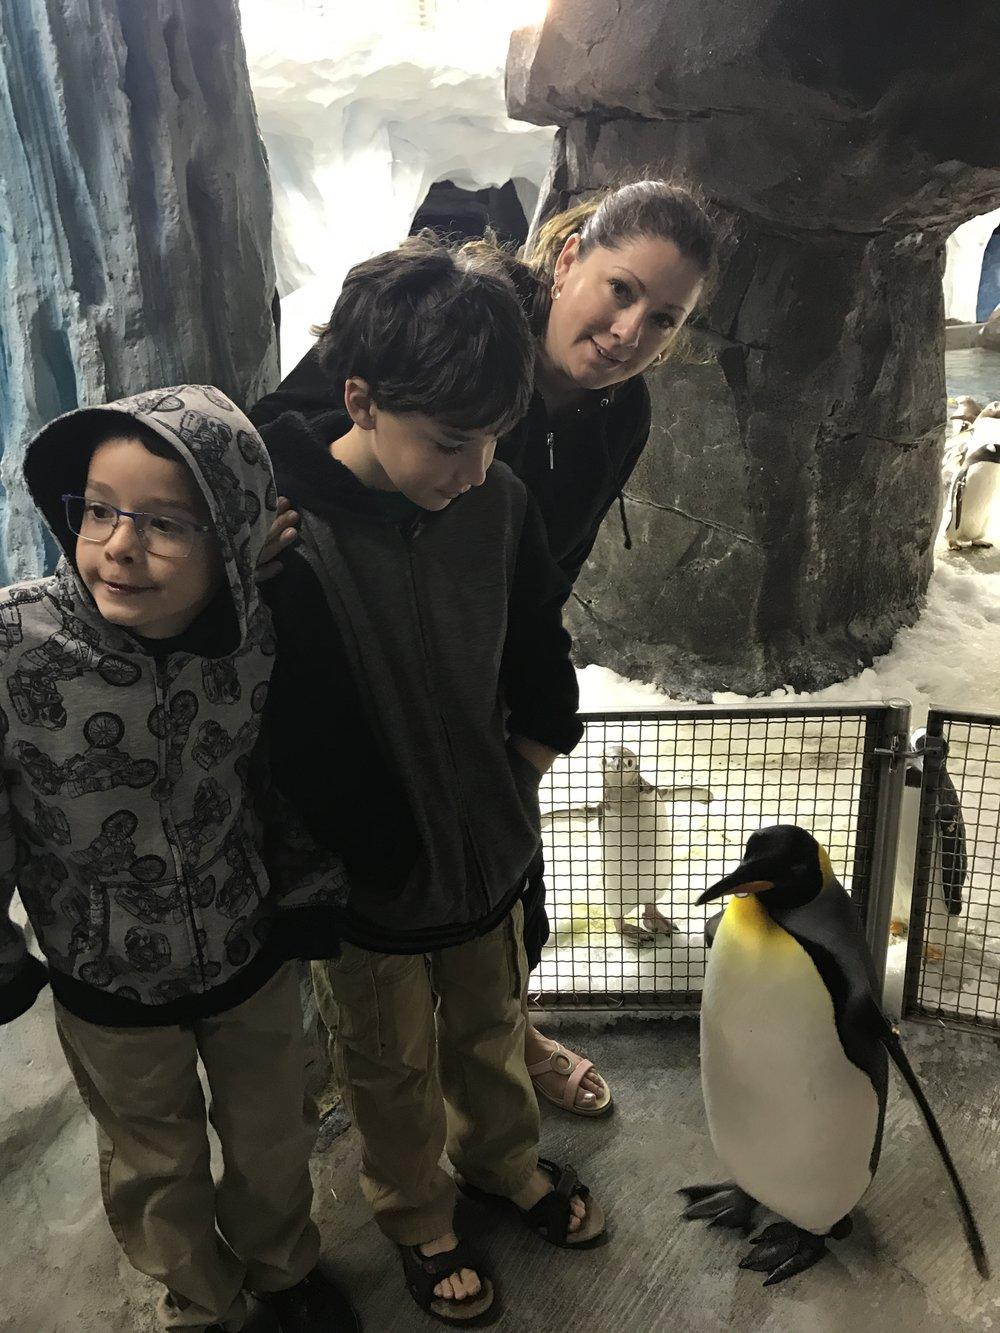 Seaworld Orlando Penguin Up Close Tour Review Magical Storybook